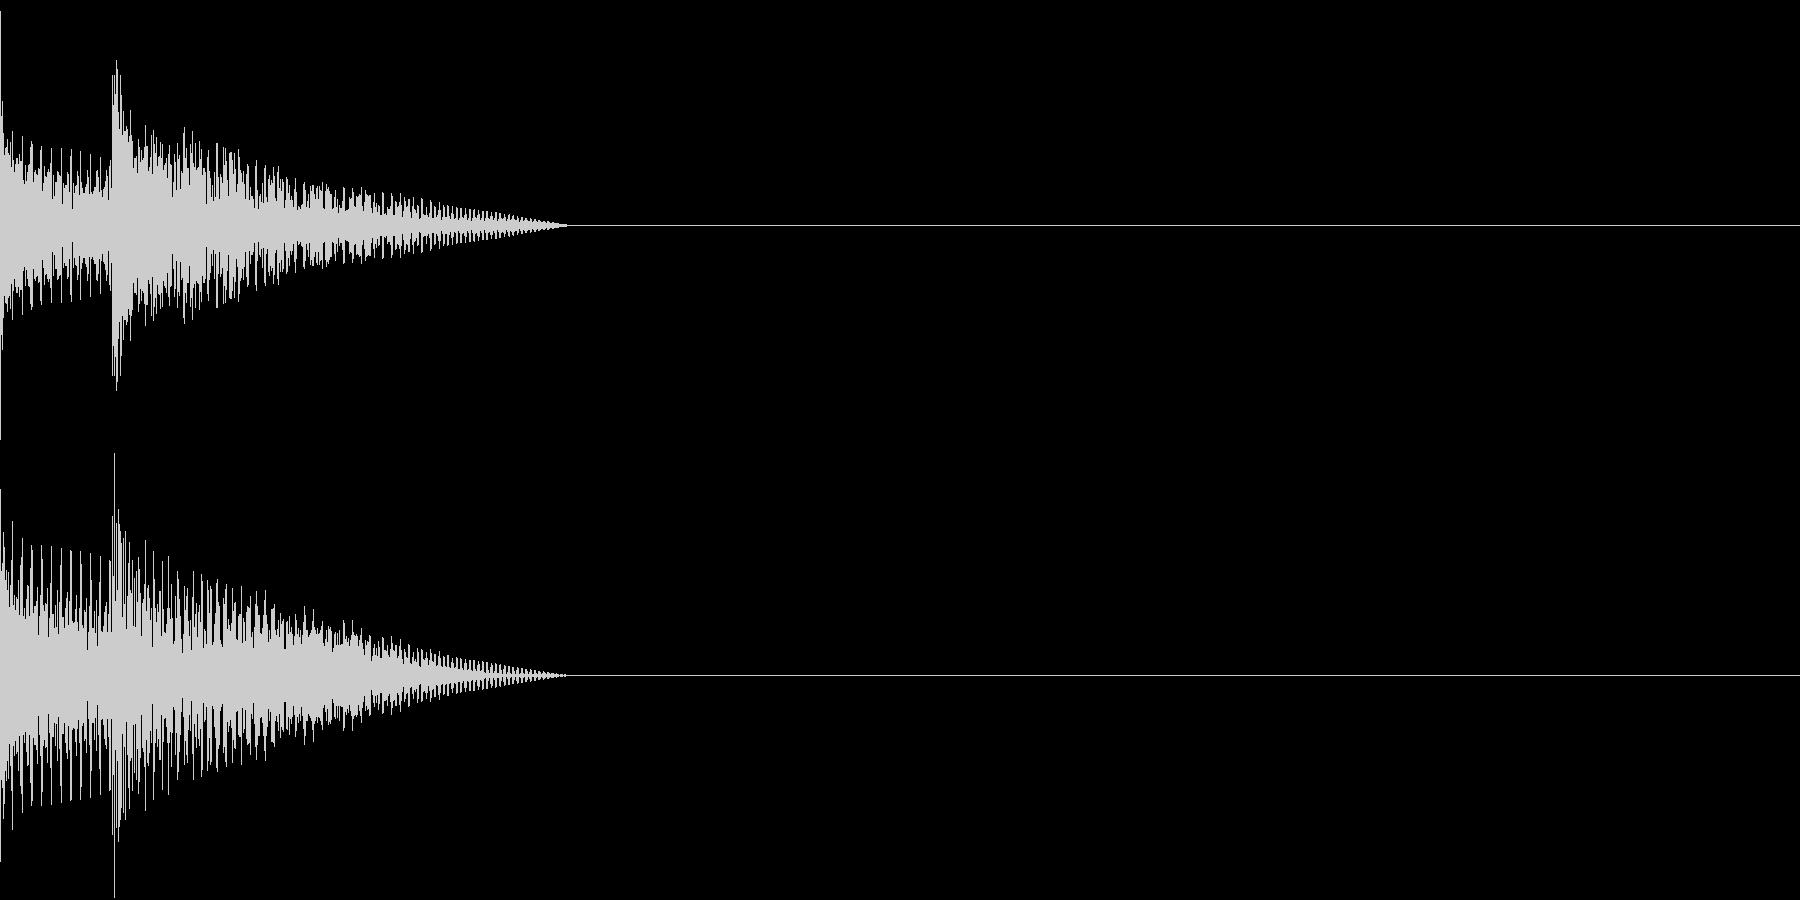 Cursor セレクト・カーソルの音4の未再生の波形